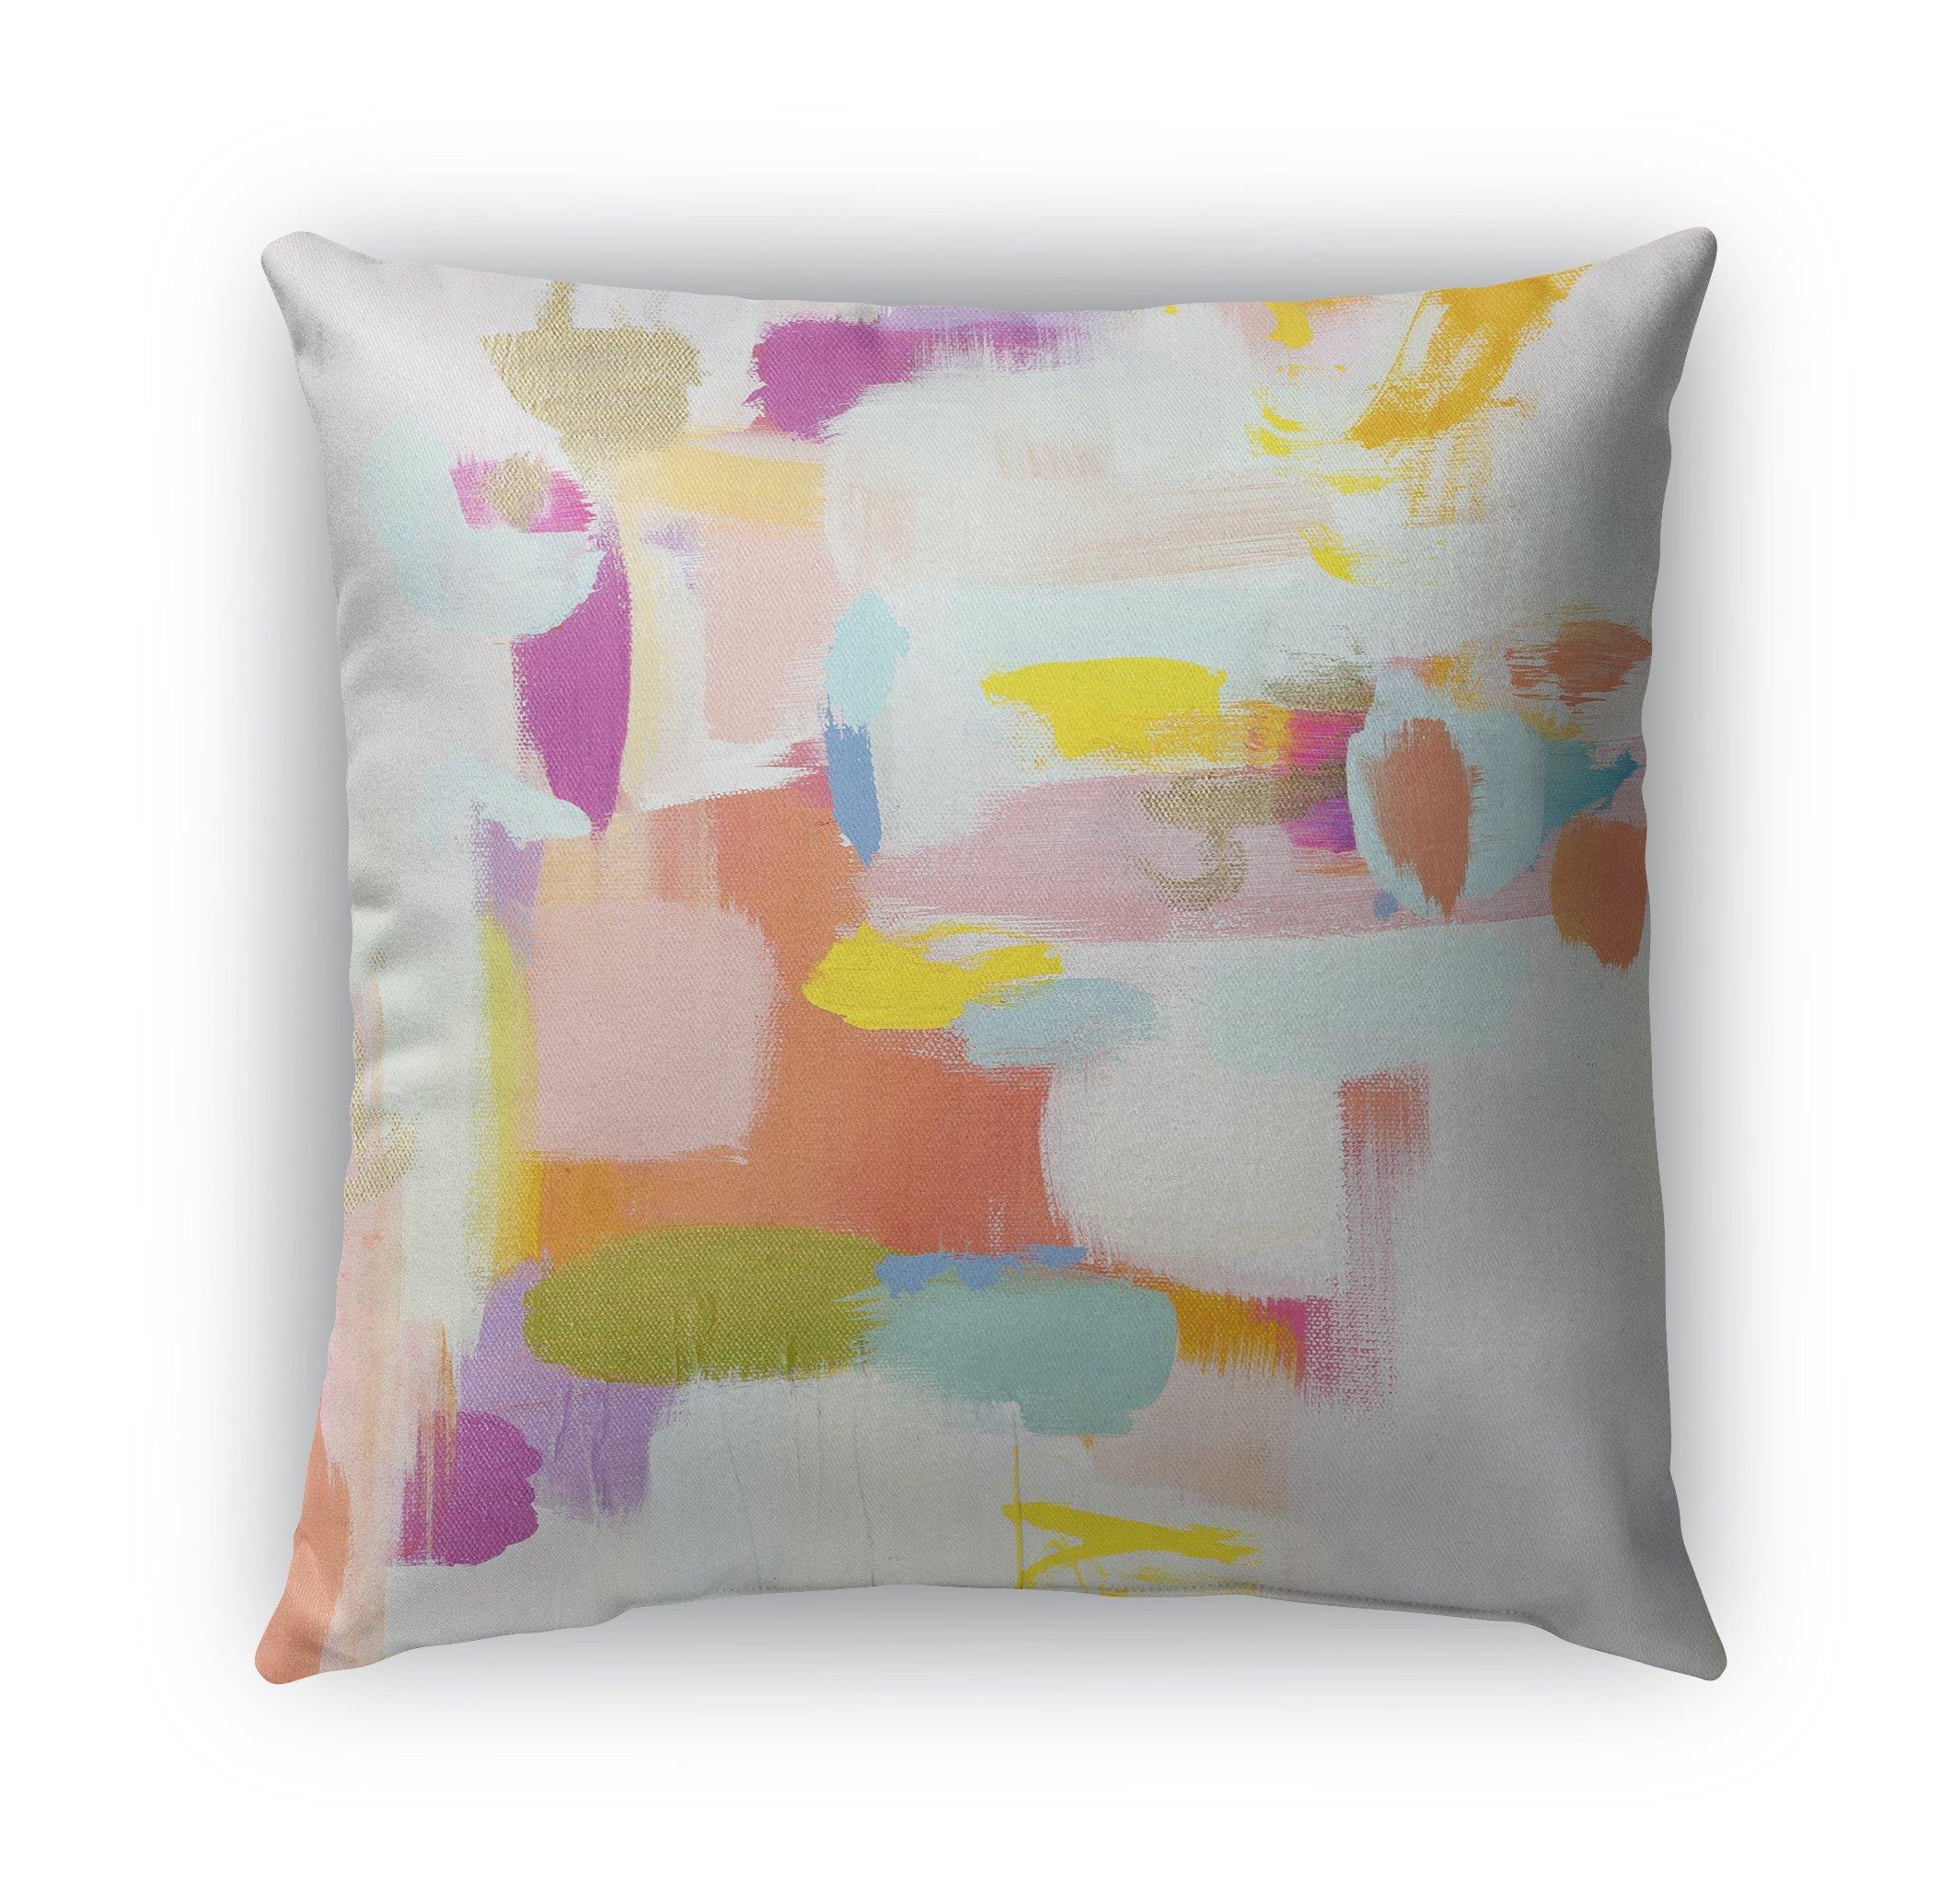 KAVKA DESIGNS Botox Bingo Throw Pillow, Multicolored - 26'' x 26''